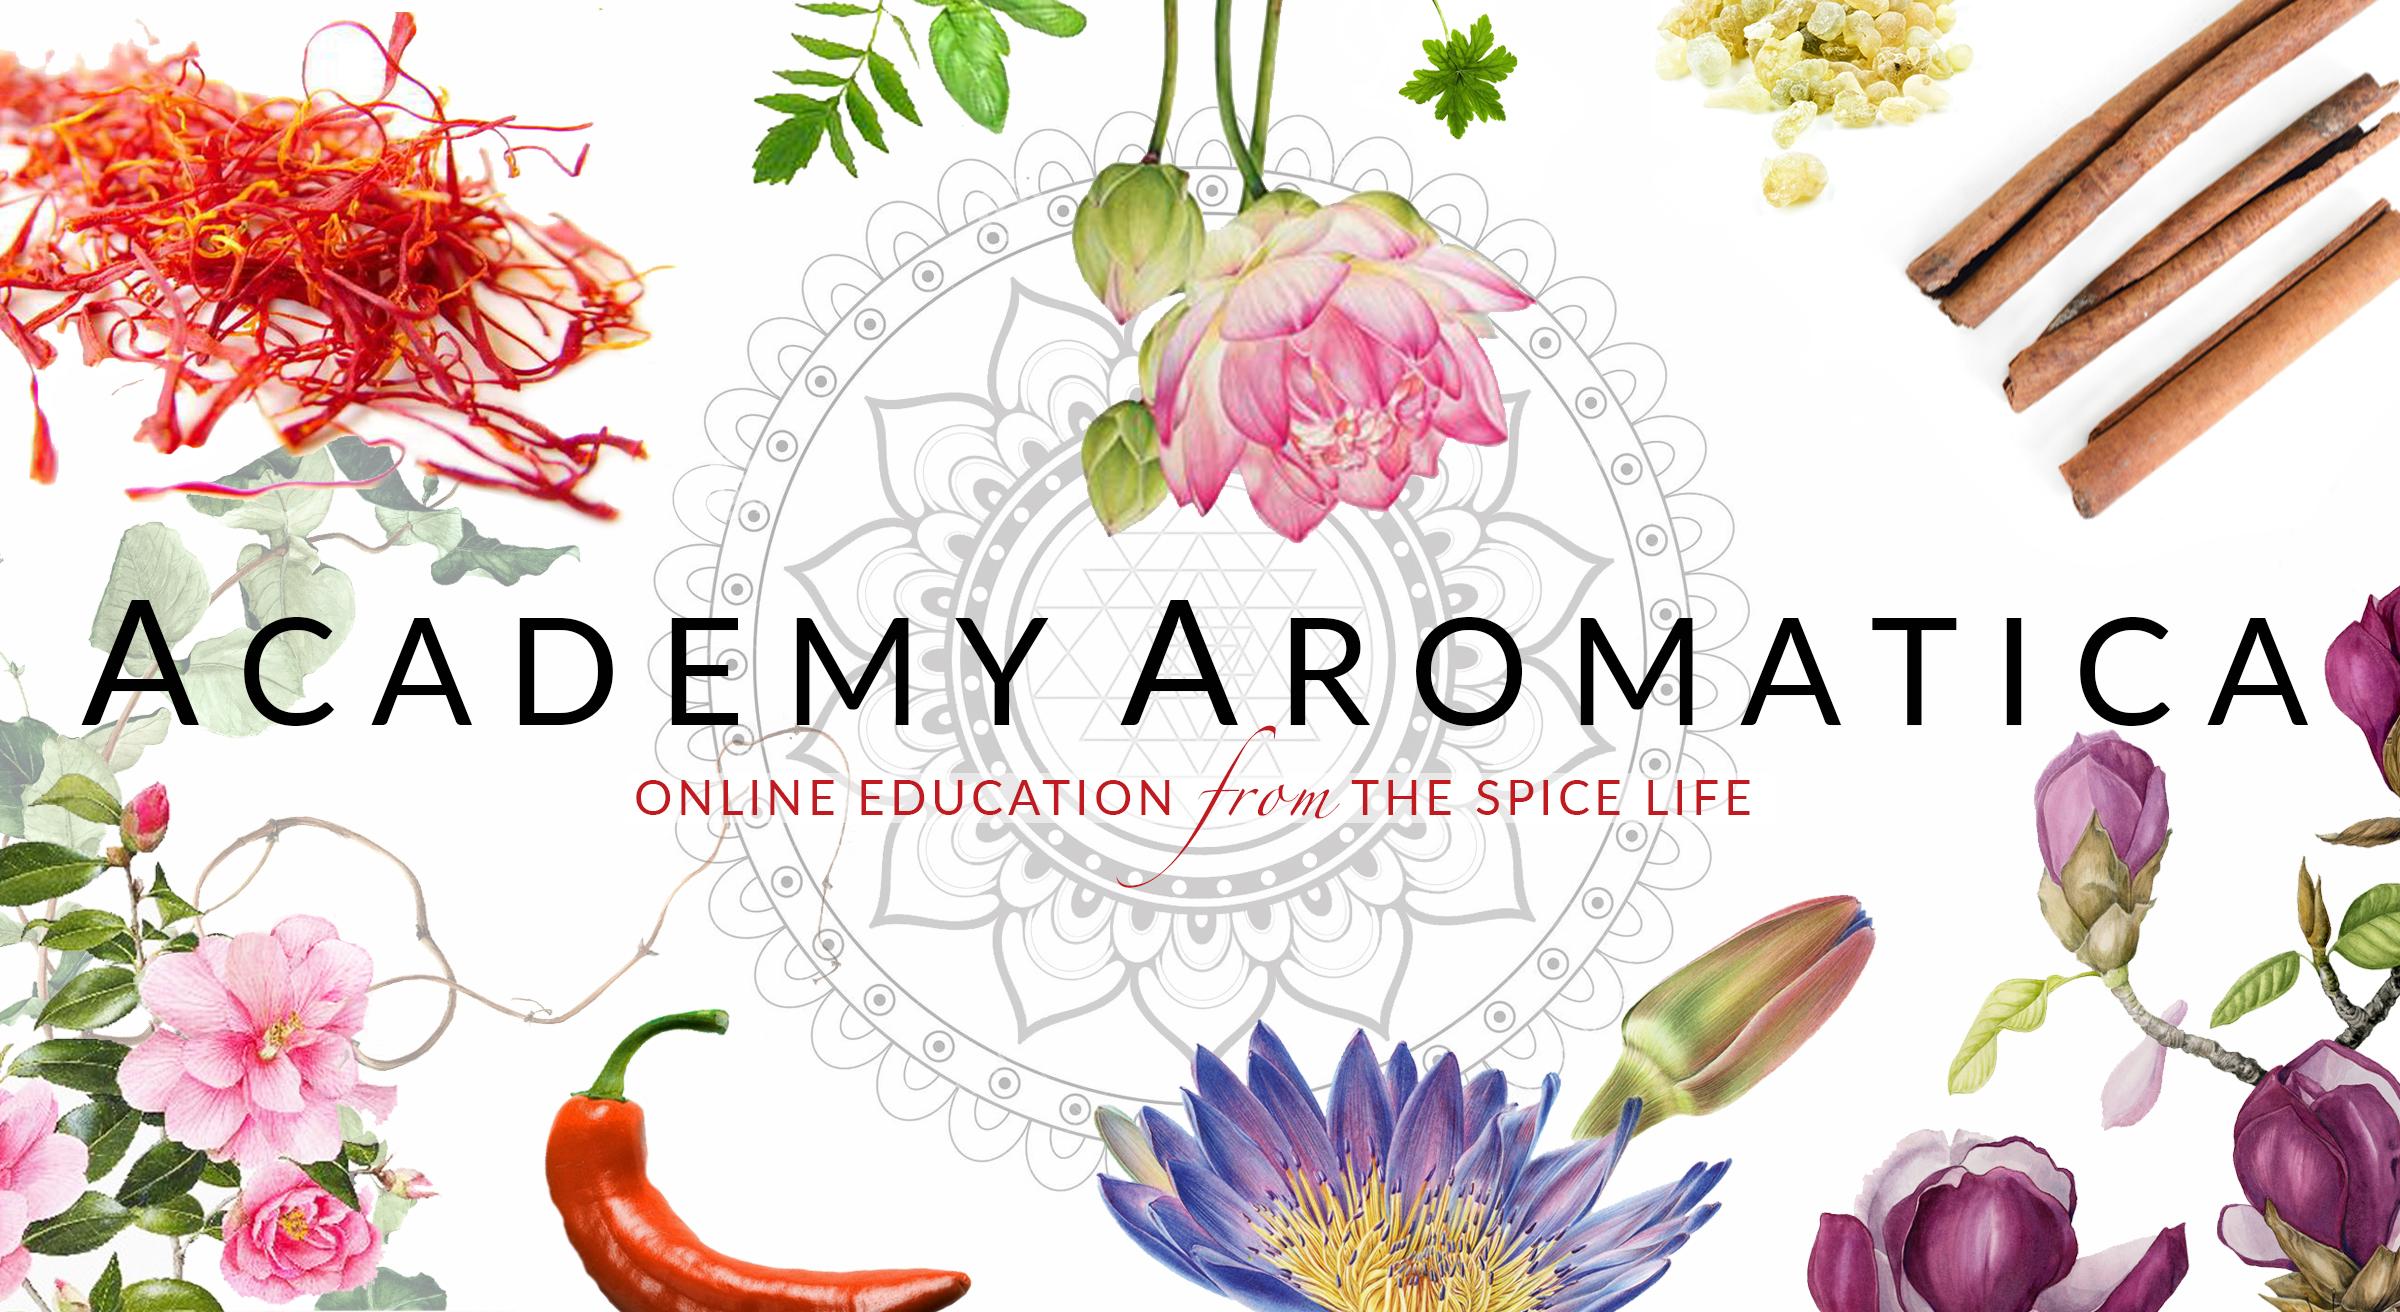 Academy Aromatica